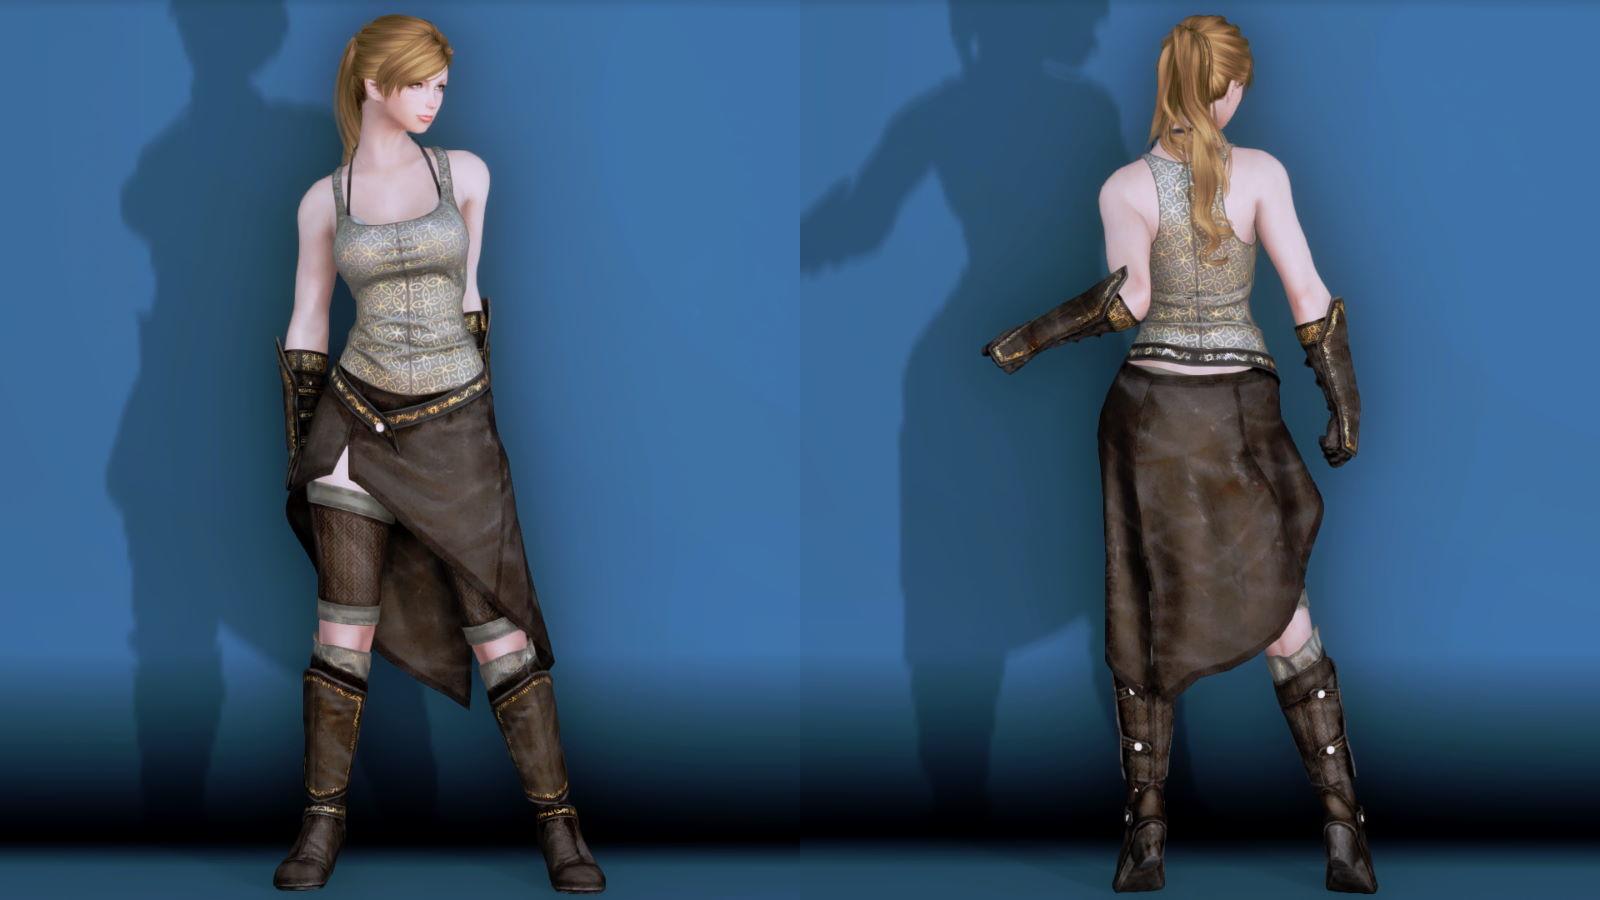 RuggedRogueSSE 211-1 Pose Fu-Ba-F Vest Skirt 2